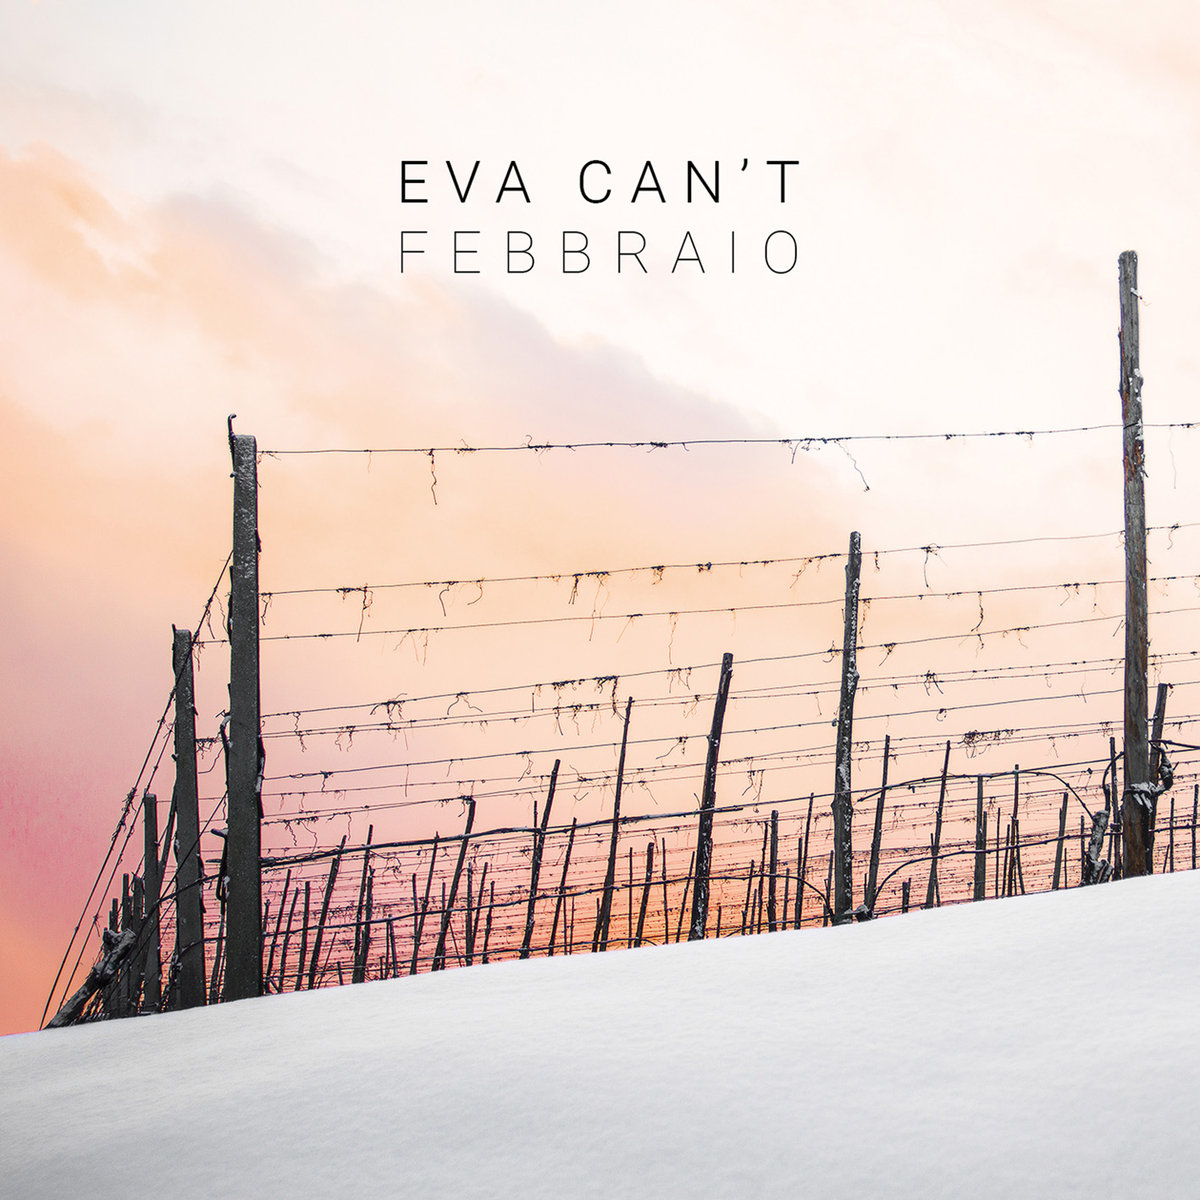 Eva Can't: Febbraio